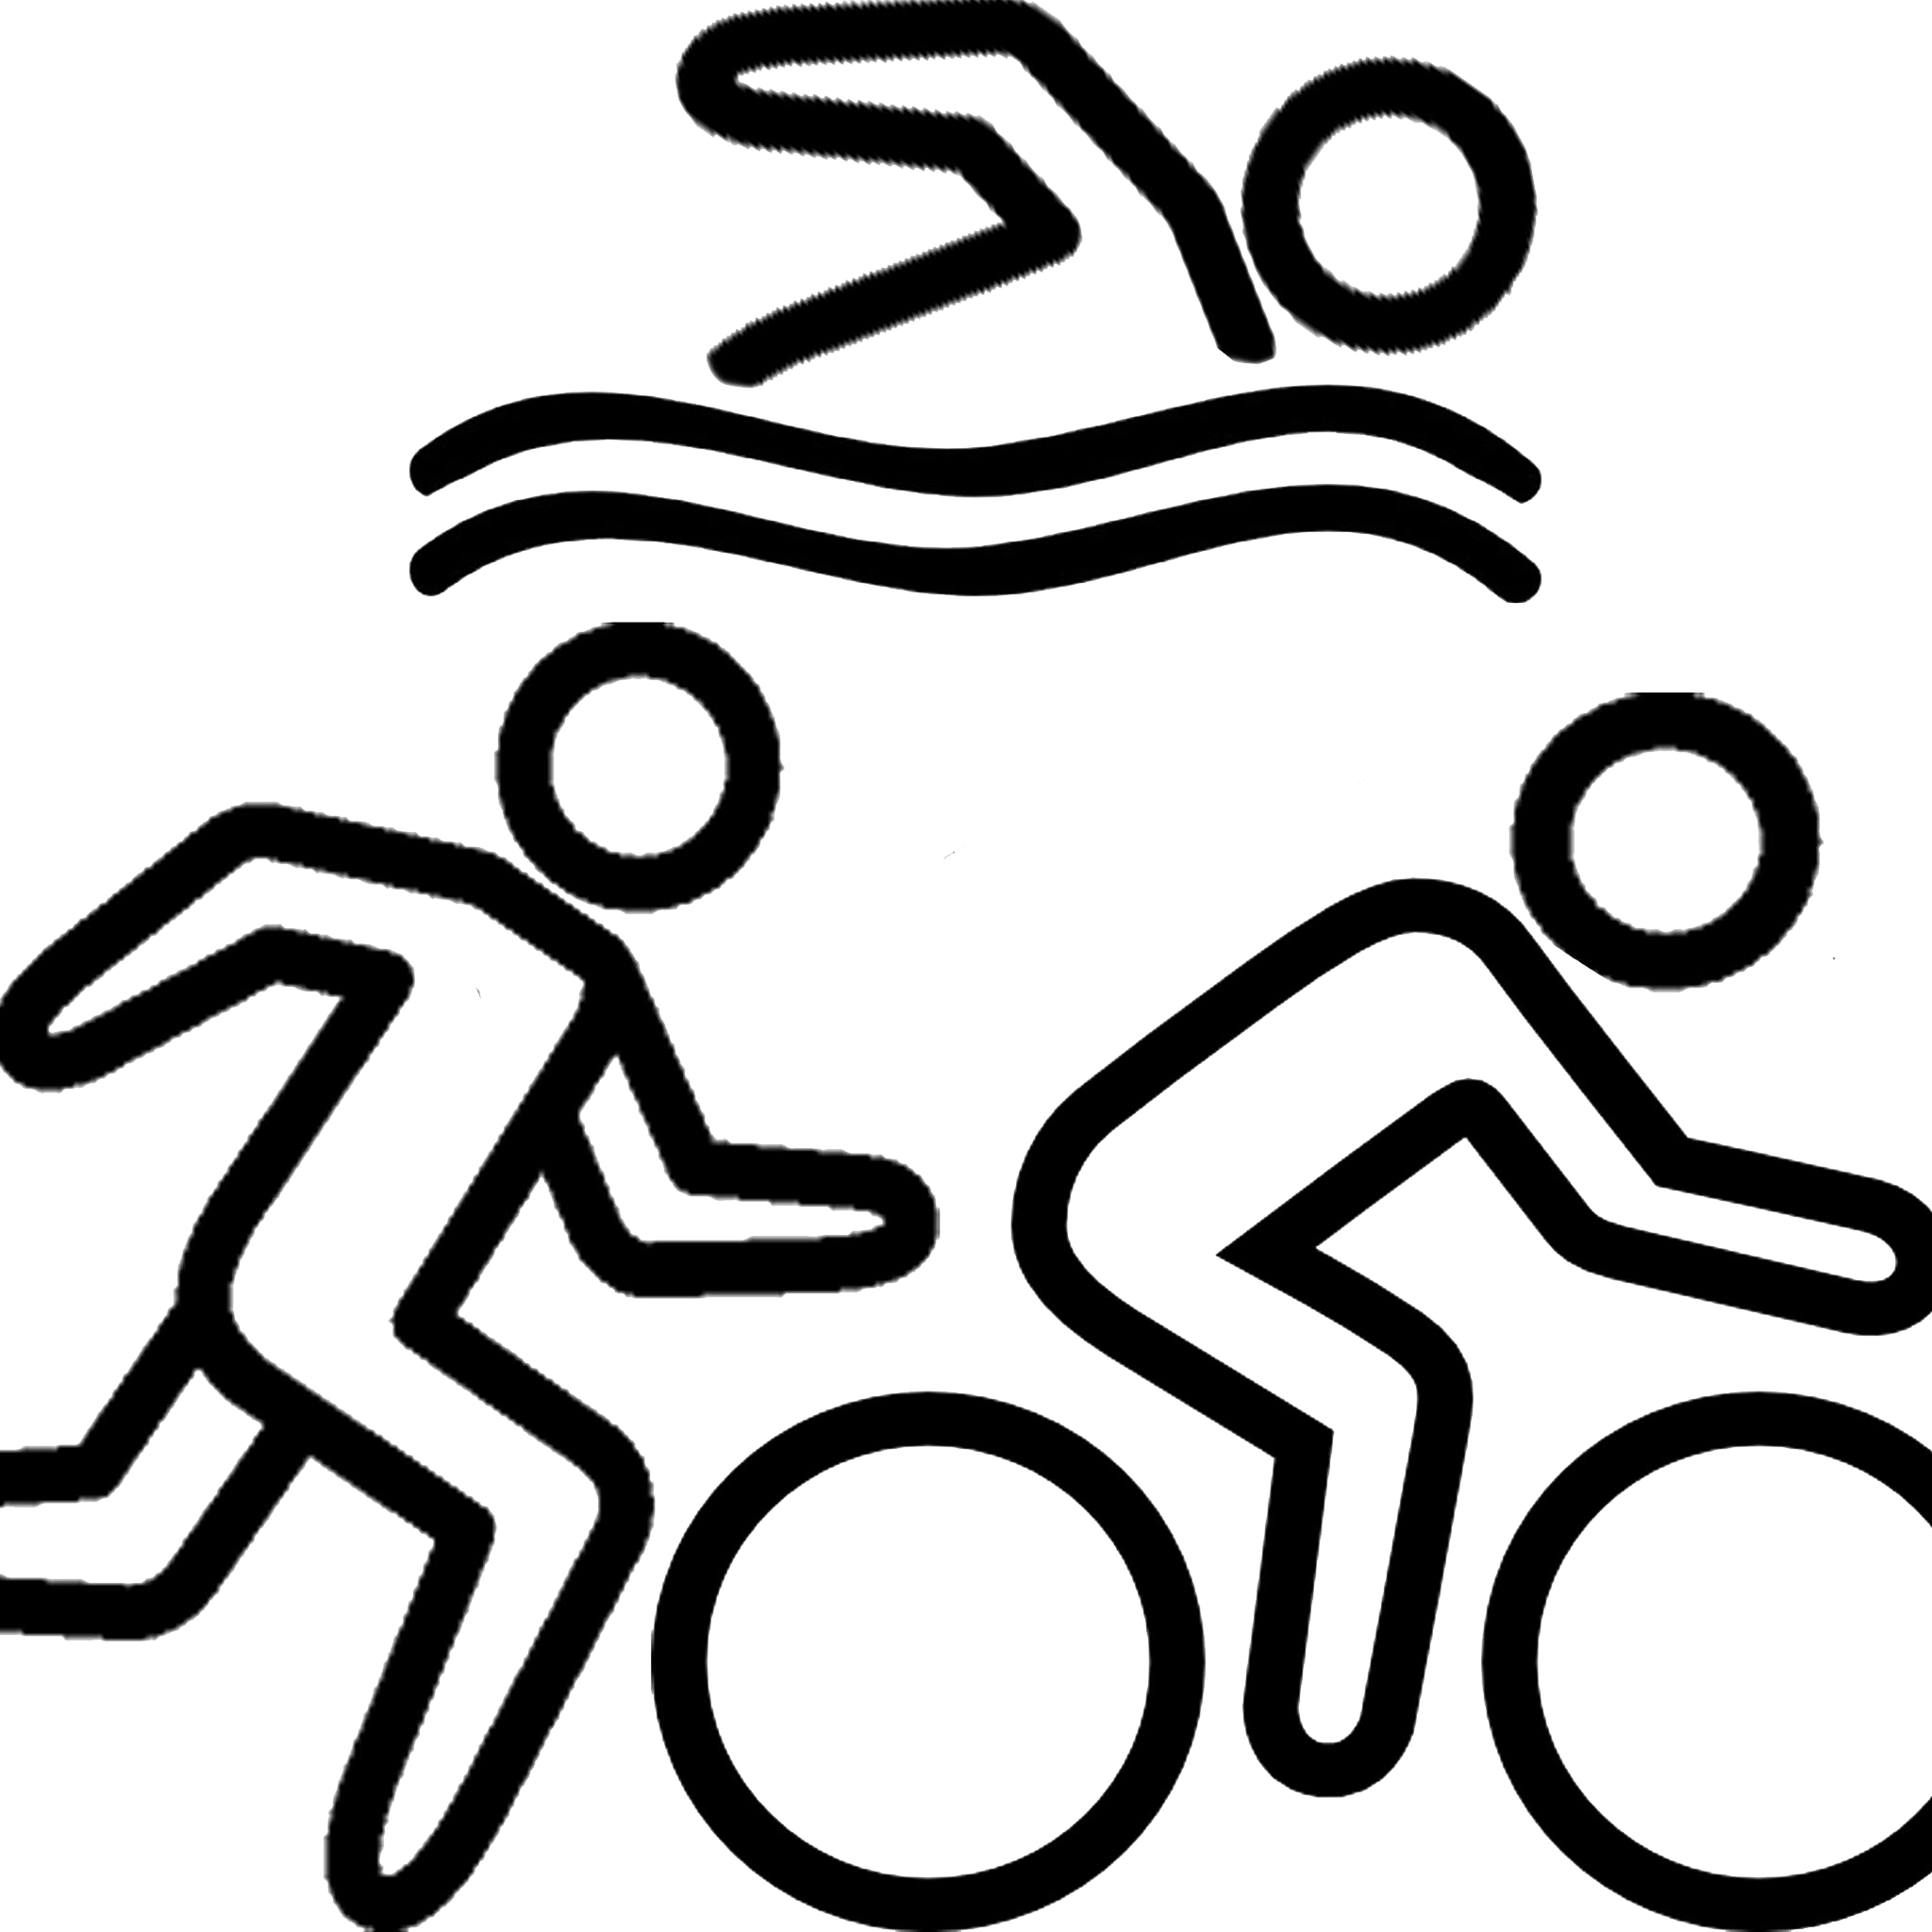 Pan Triathlon